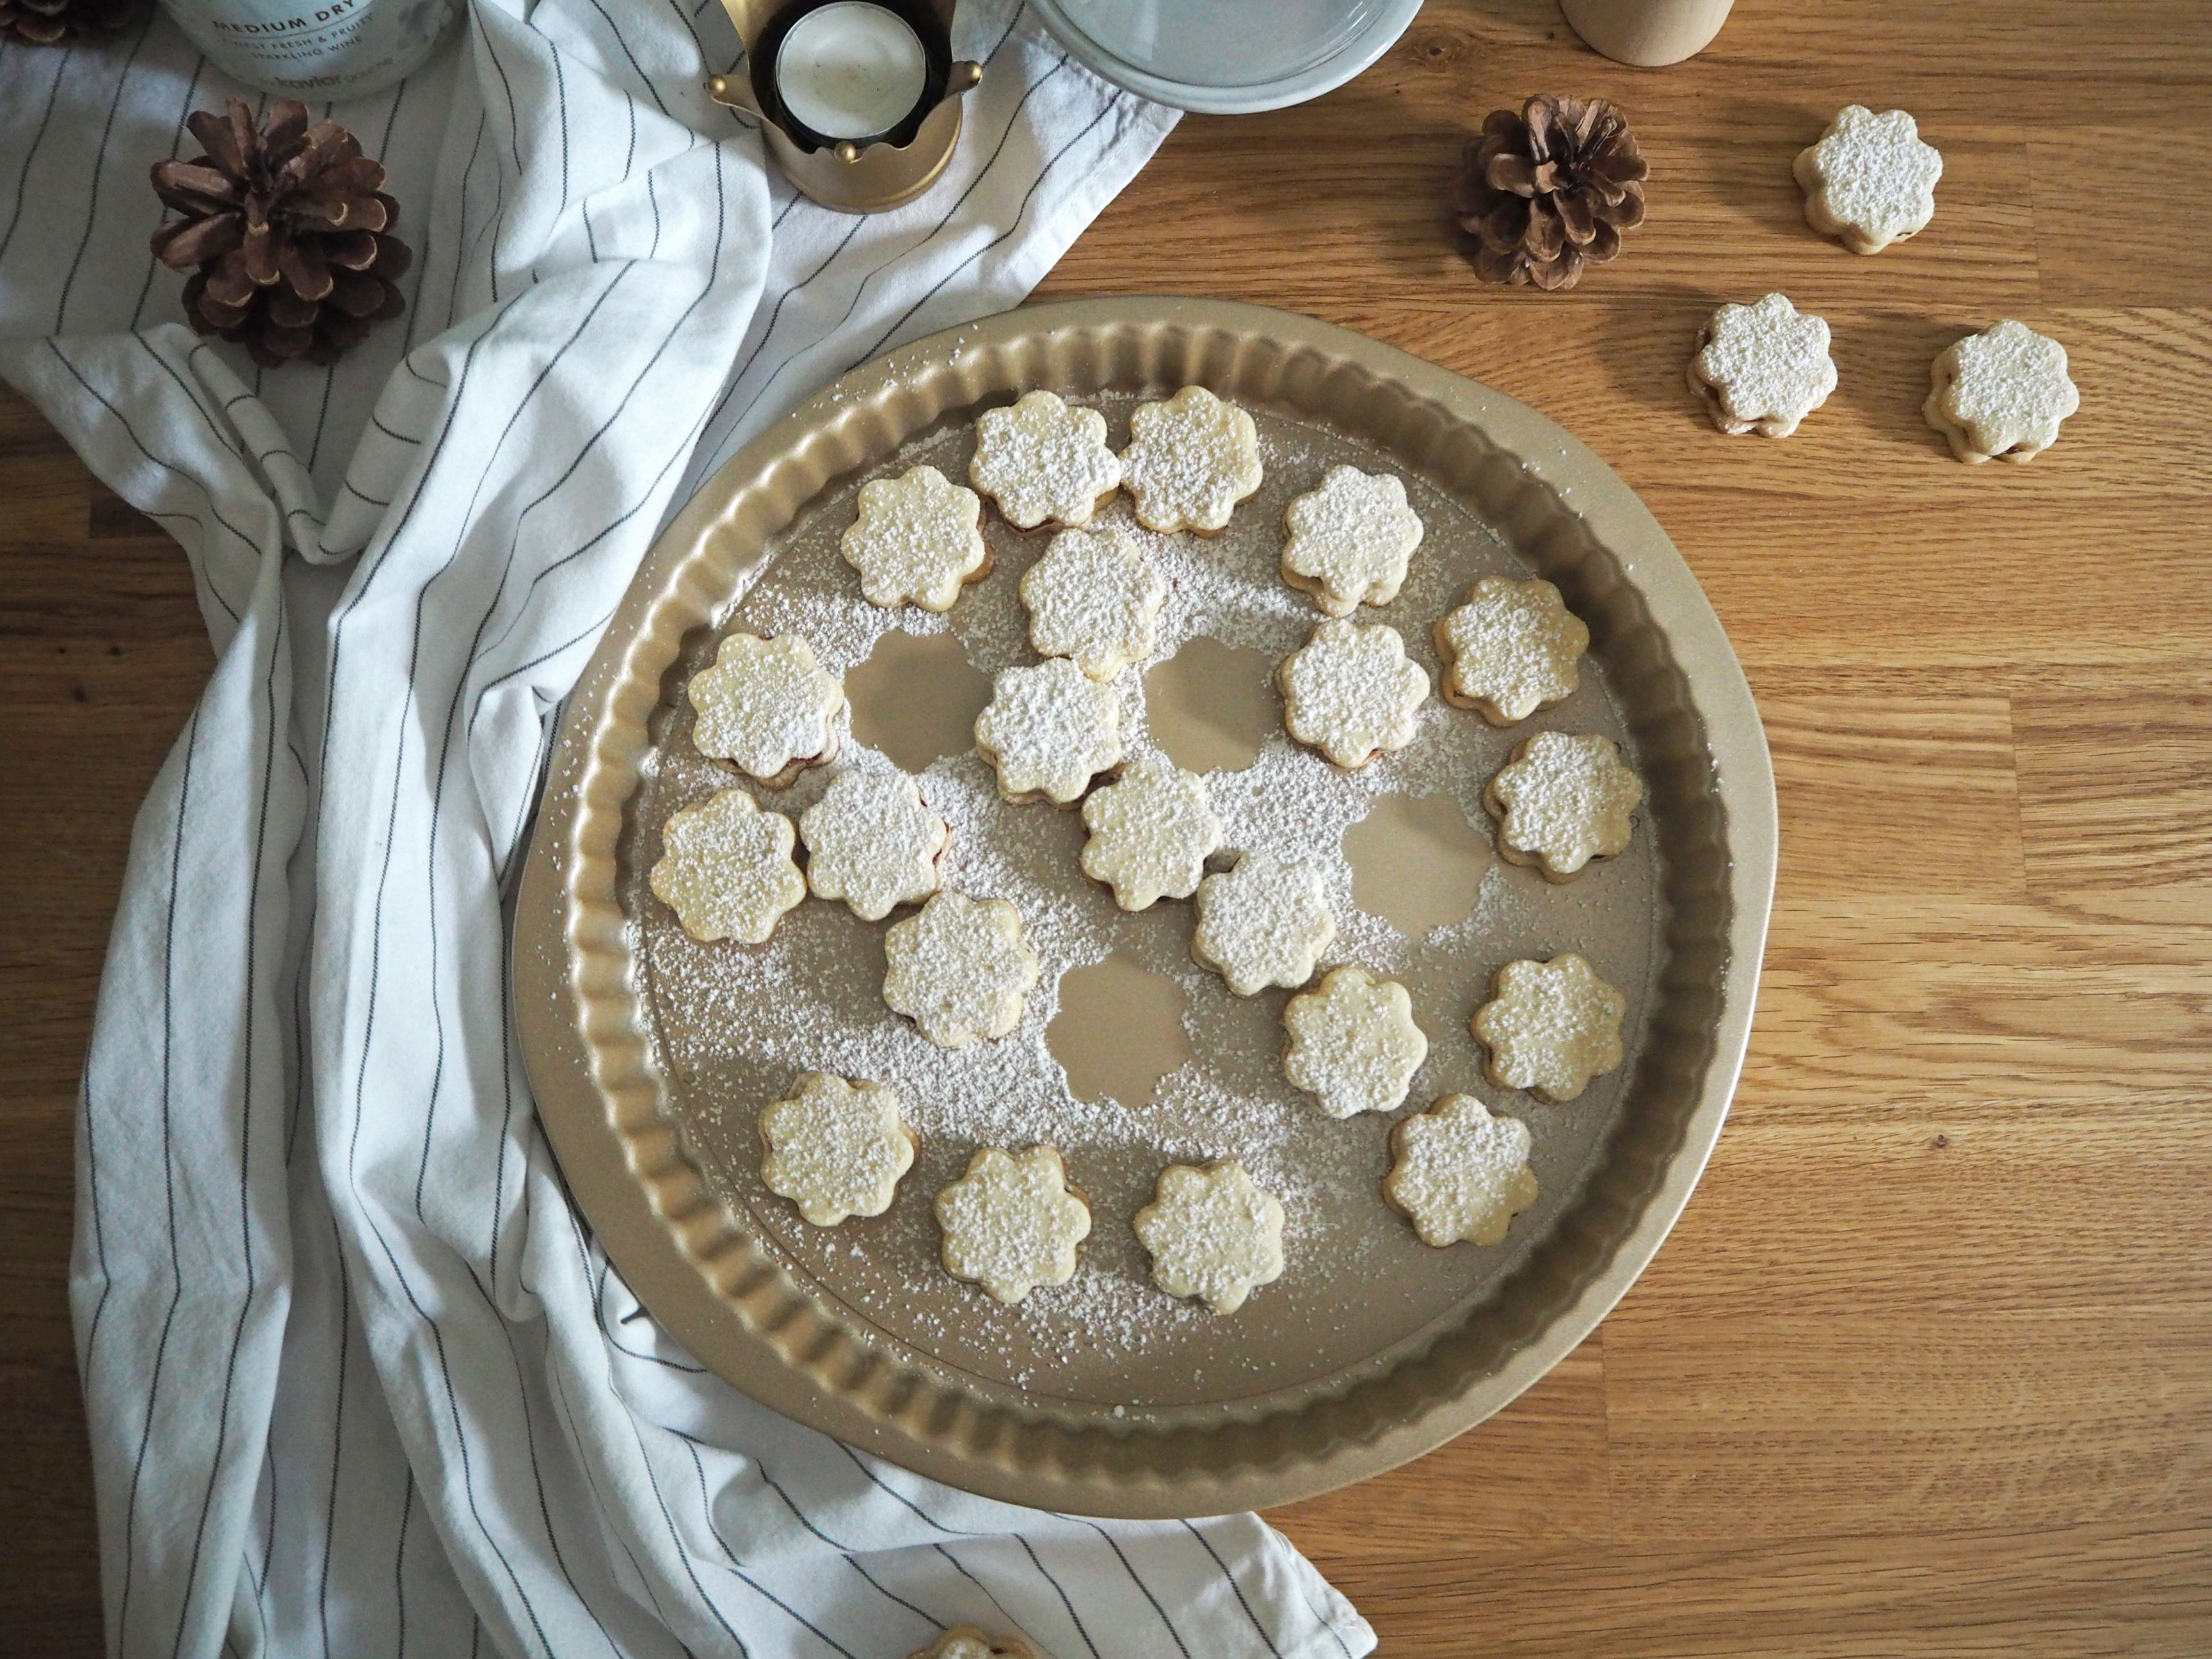 2018-skoen-och-kreativ-food-god-jul-plaetzchen-vanille-cookies-mit-marmelade (3)